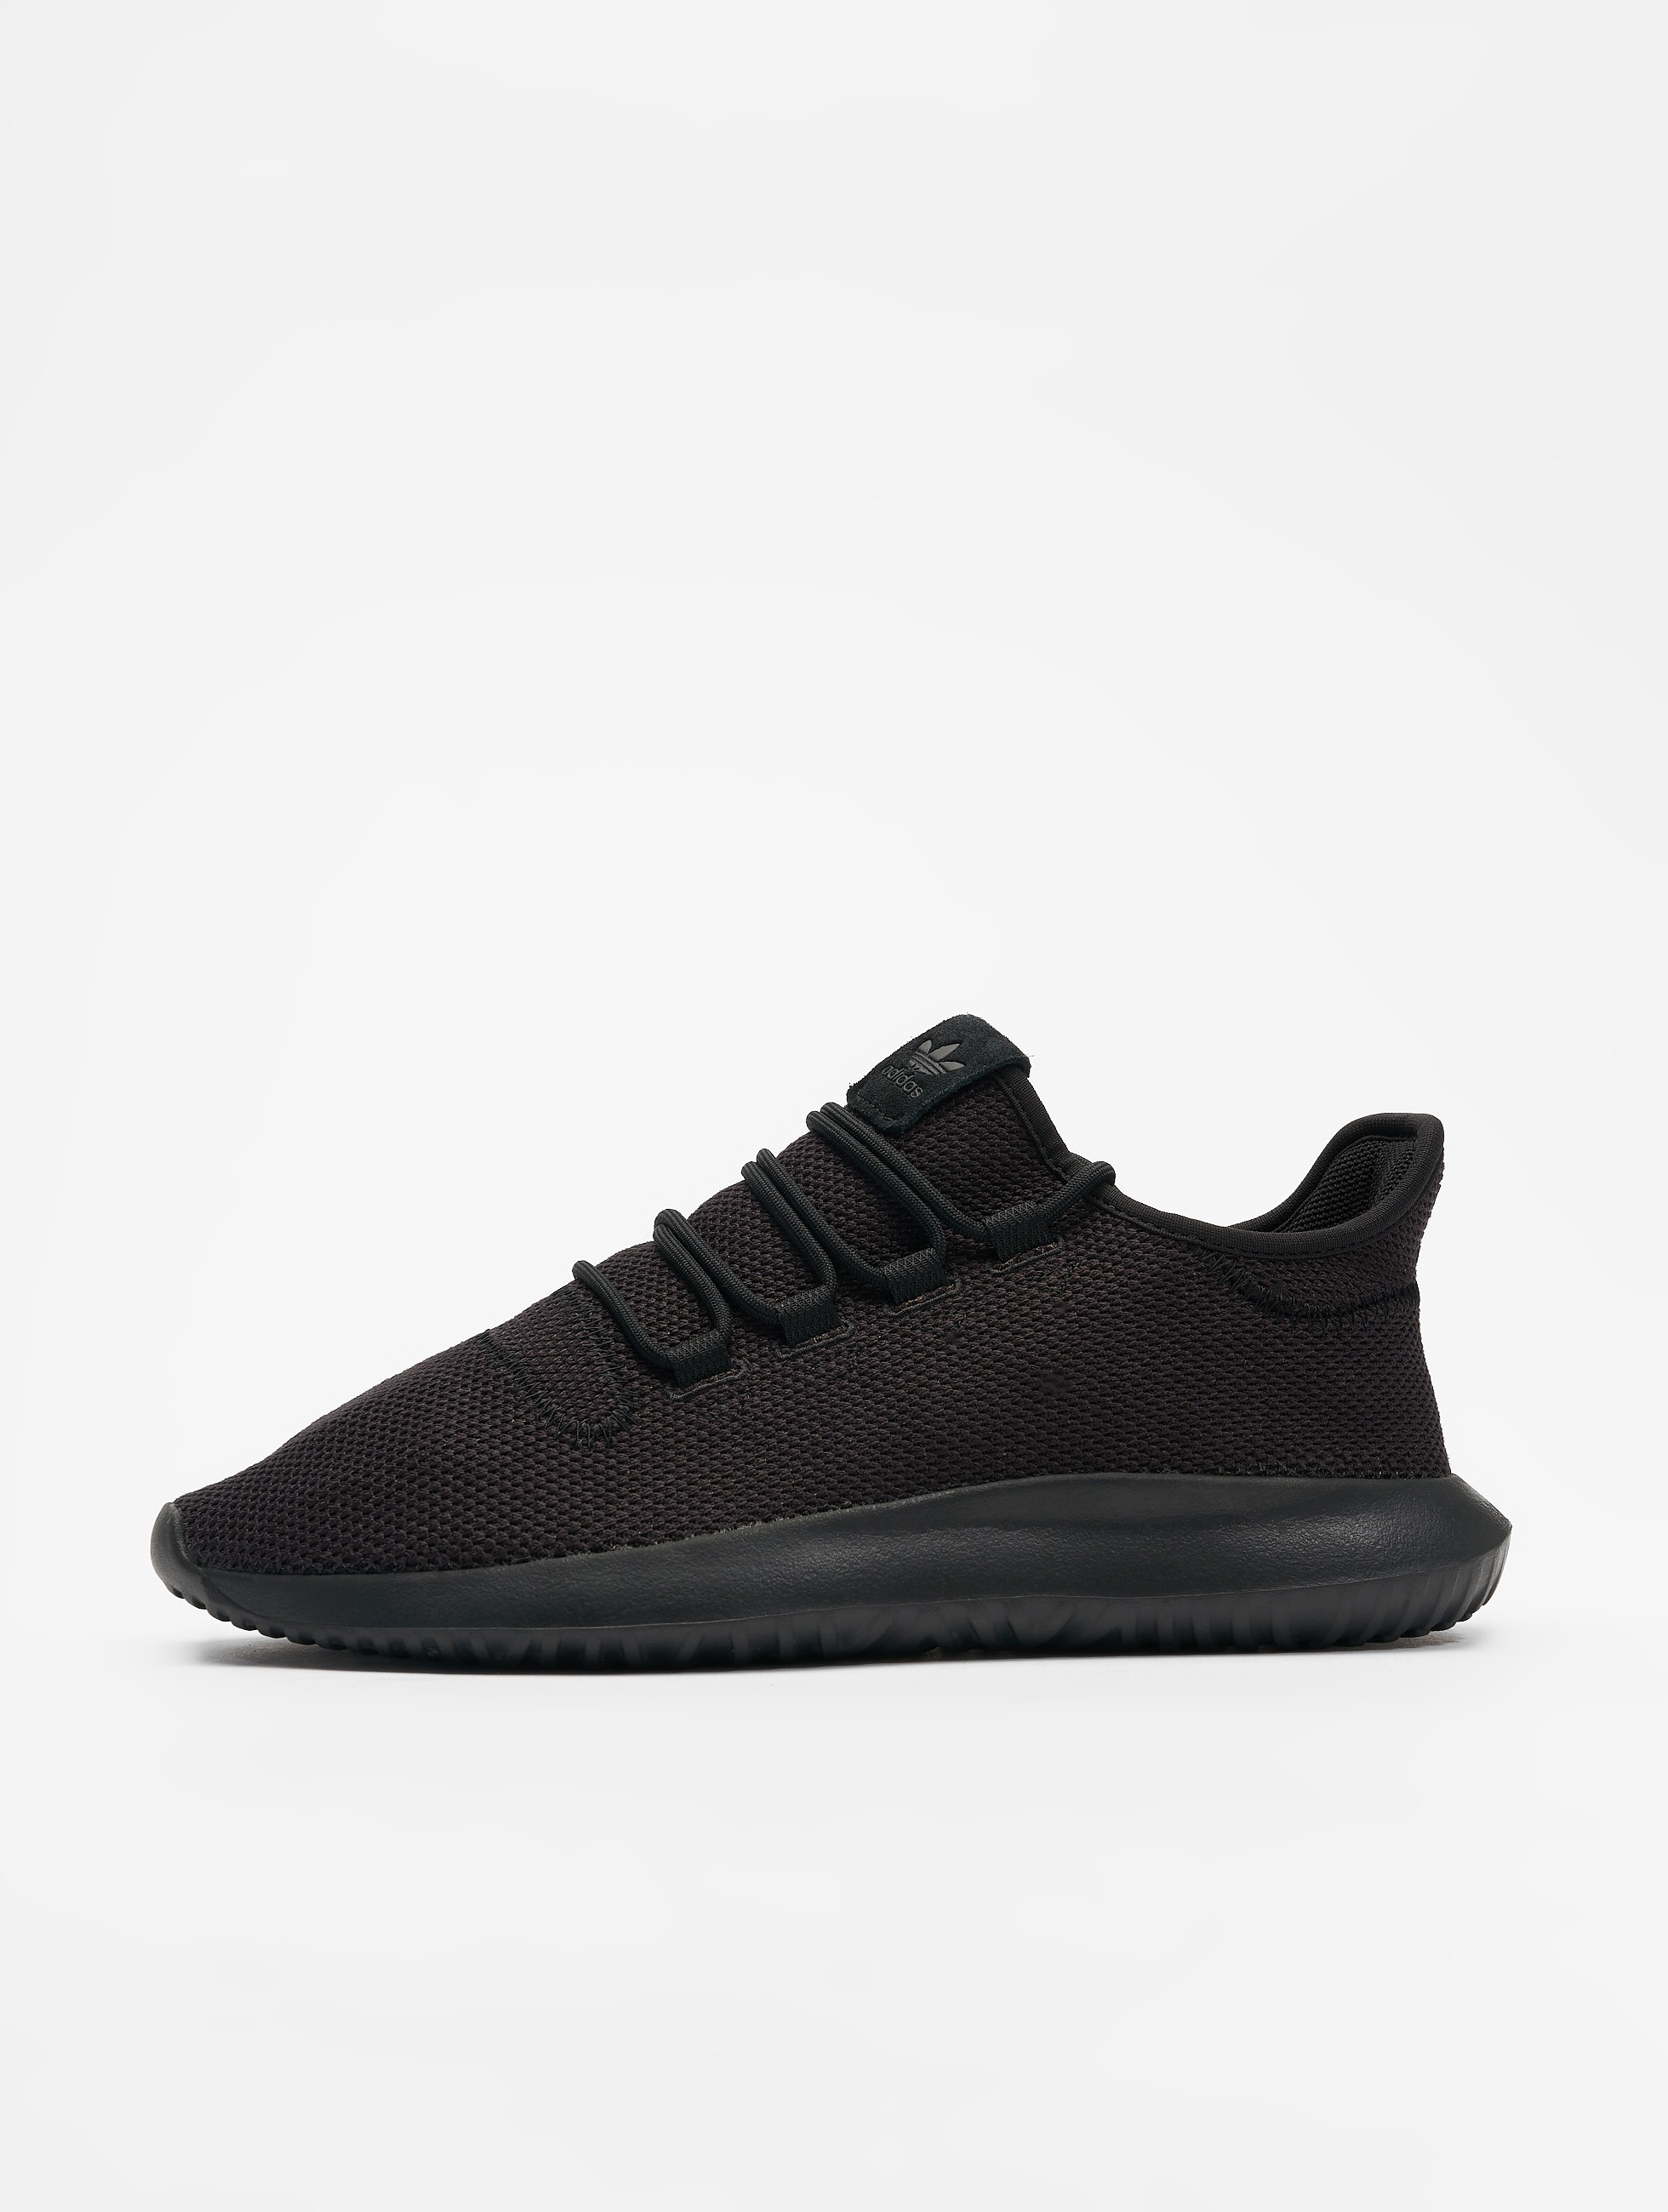 Sneaker Tubular Shadow in schwarz